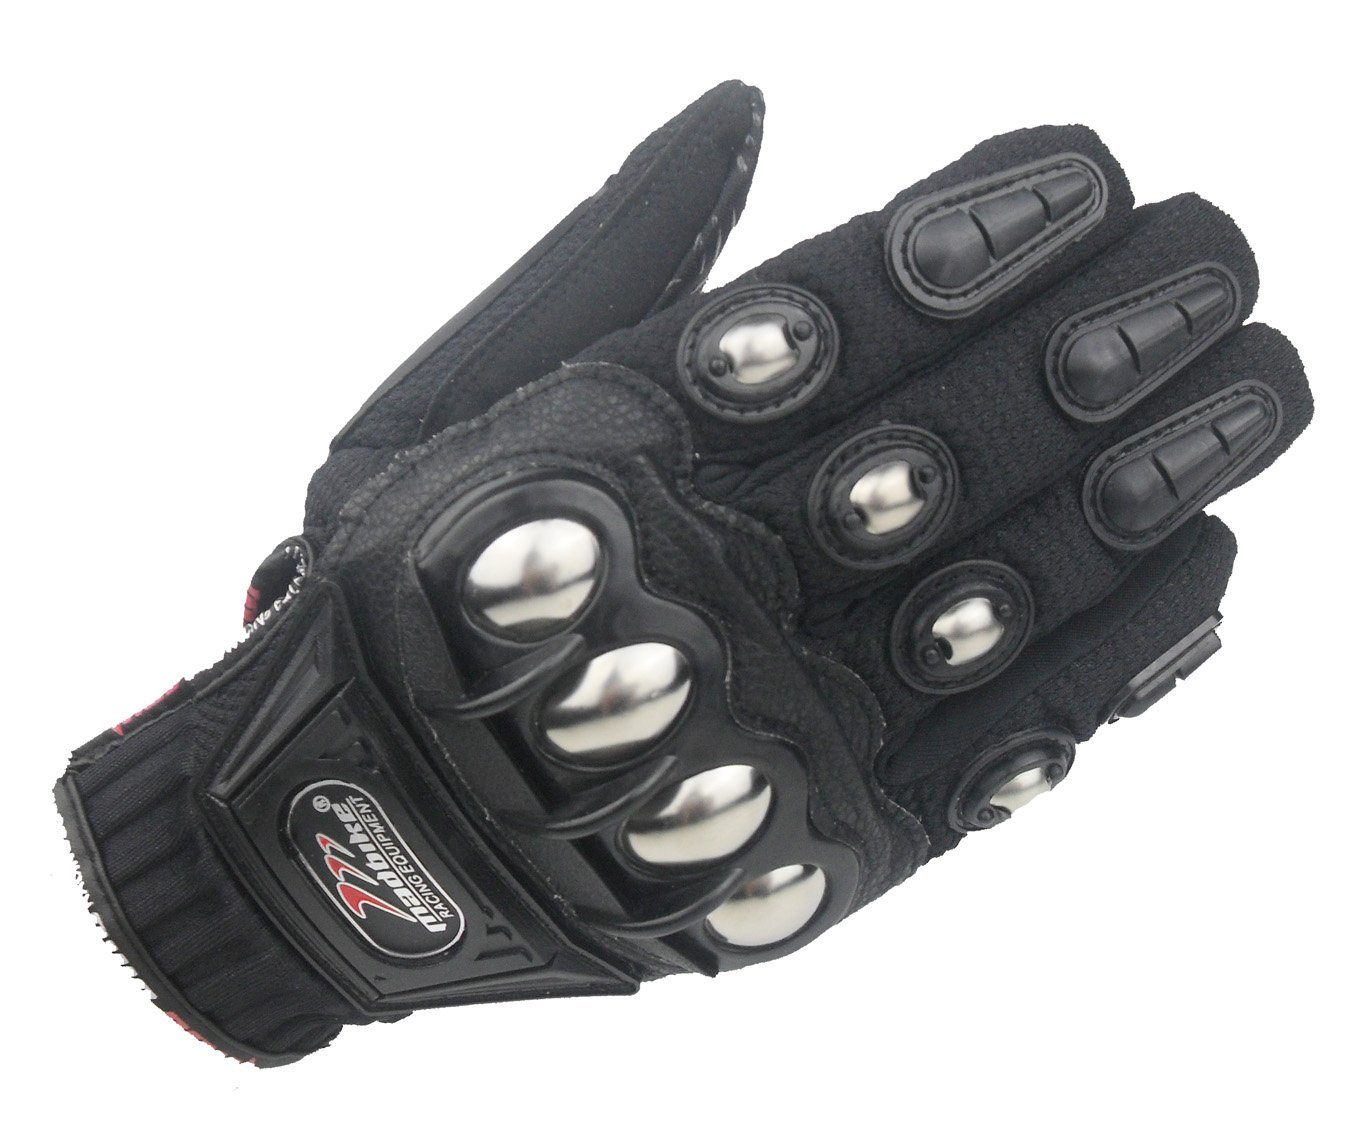 Madbike Glove Motorcycle Racing Motorbike Gloves Alloy Steel Protection XXL